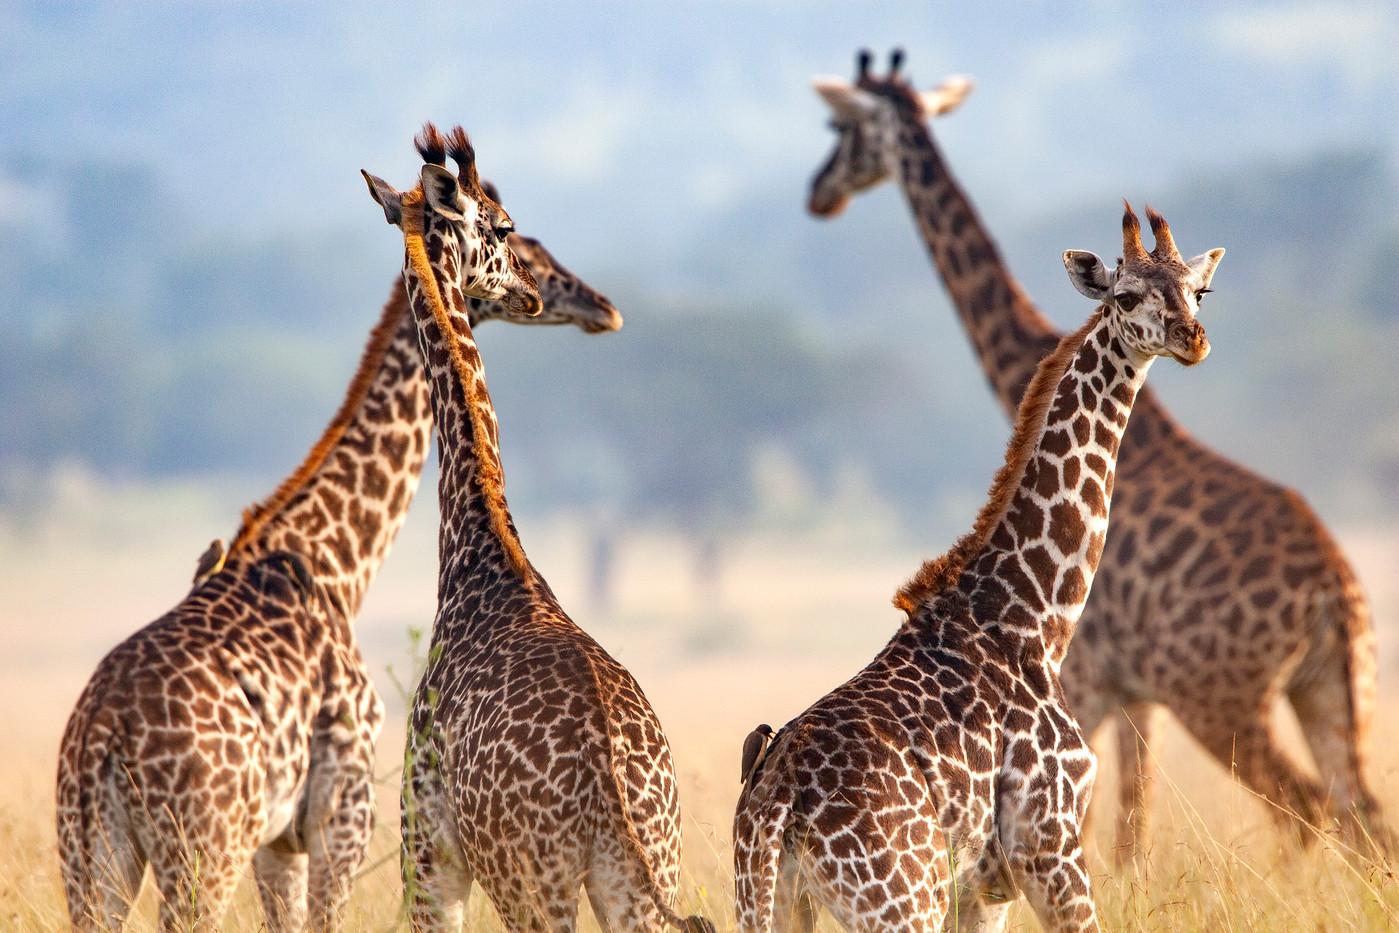 Masai Giraffe in the Serengeti NP, Tanzania